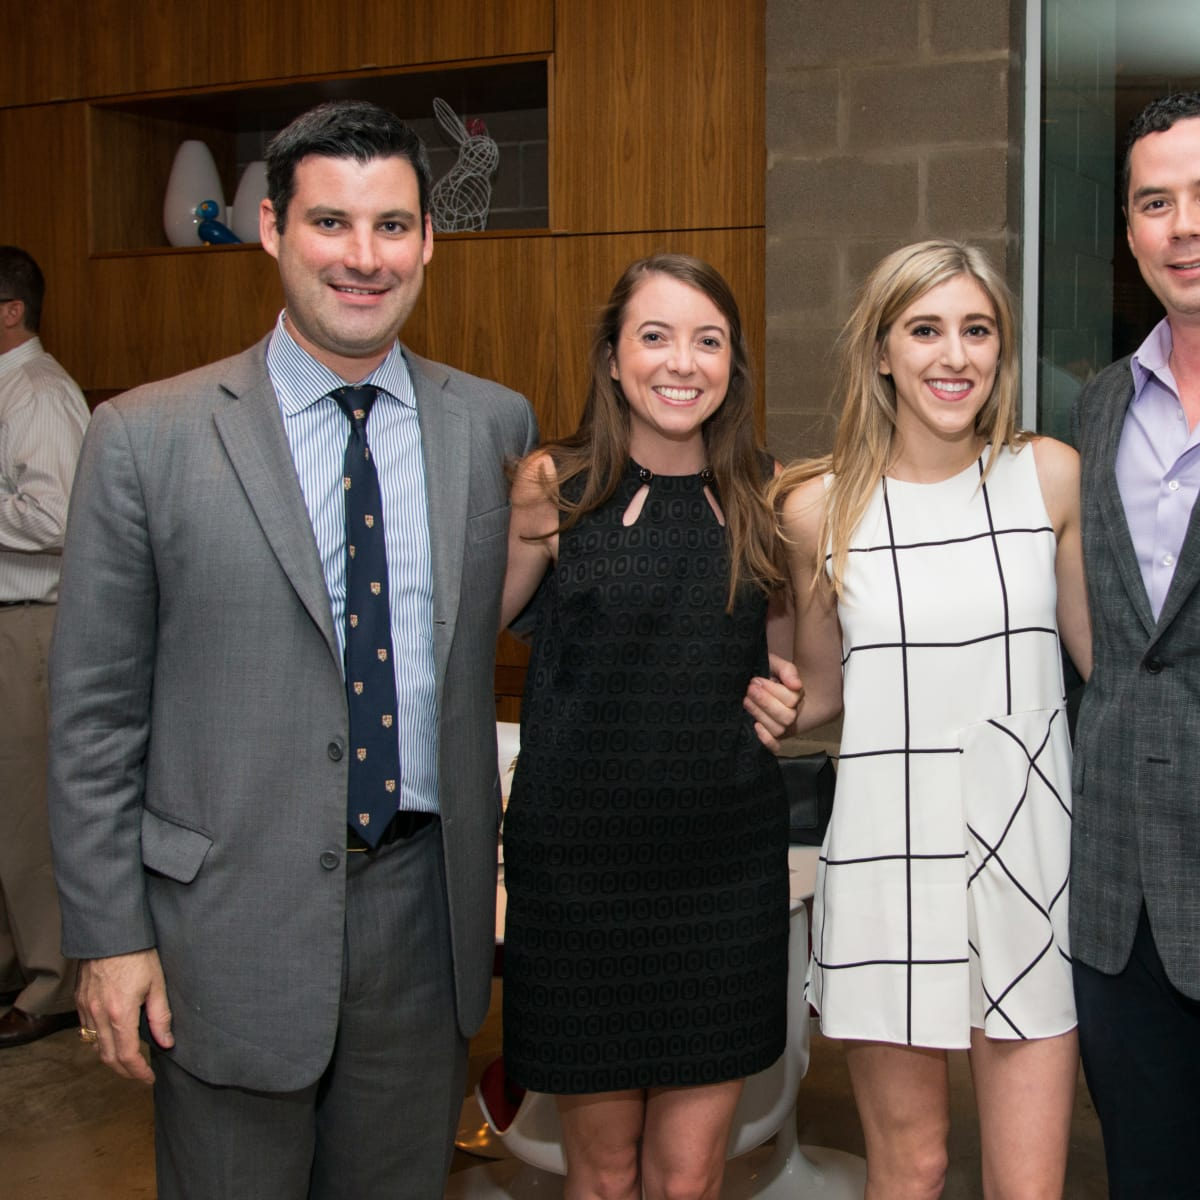 Houston, HGO Young Patrons event, October 2015, Justin Mitchell, Katherine Butler, Corrine Laporte, Claudio Gutierrez